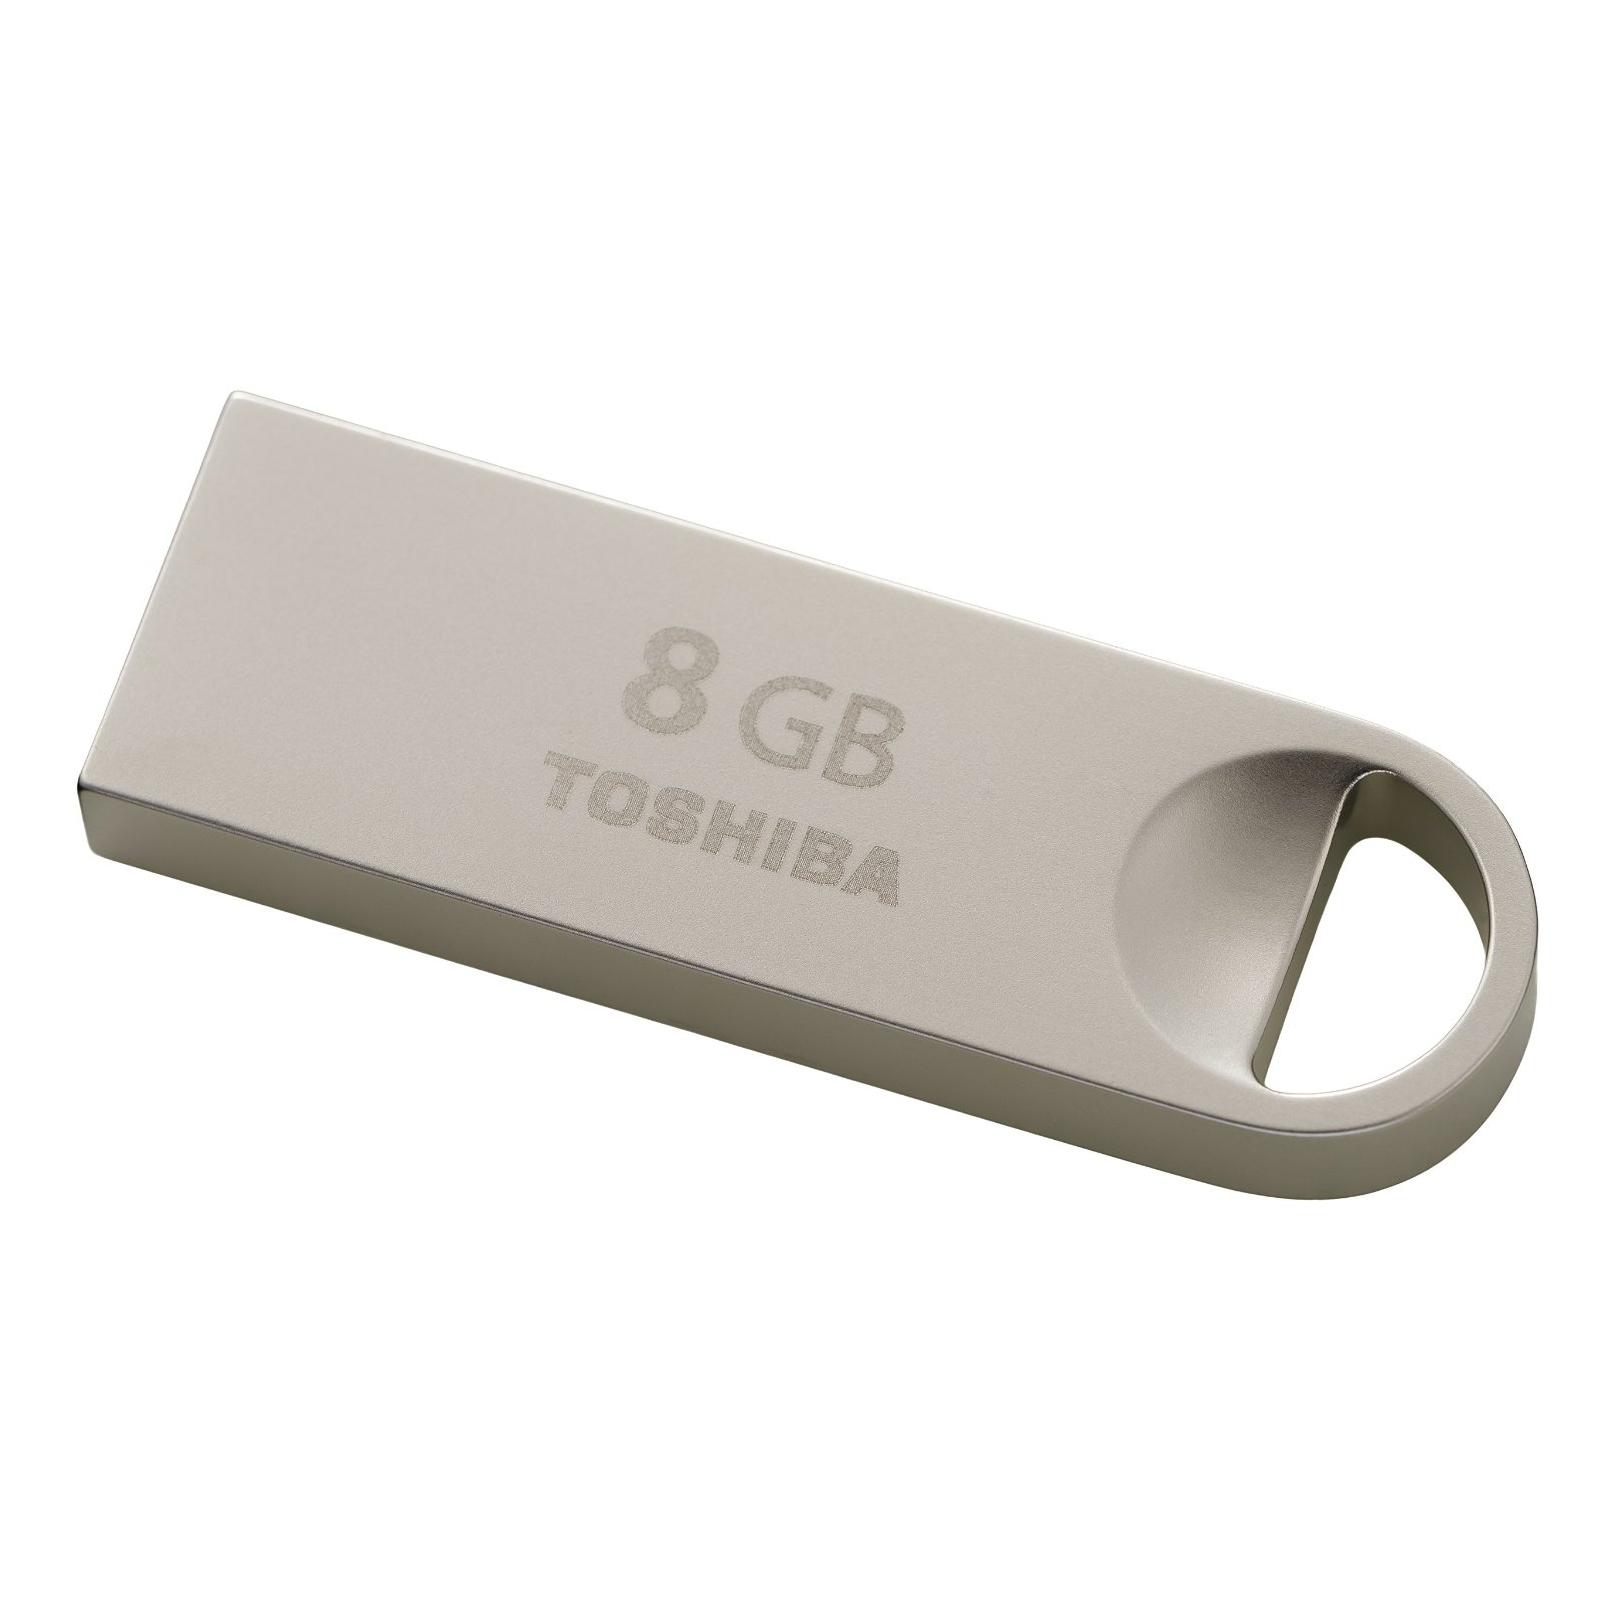 USB флеш накопитель TOSHIBA 8GB Owari Metal USB 2.0 (THN-U401S0080E4) изображение 3